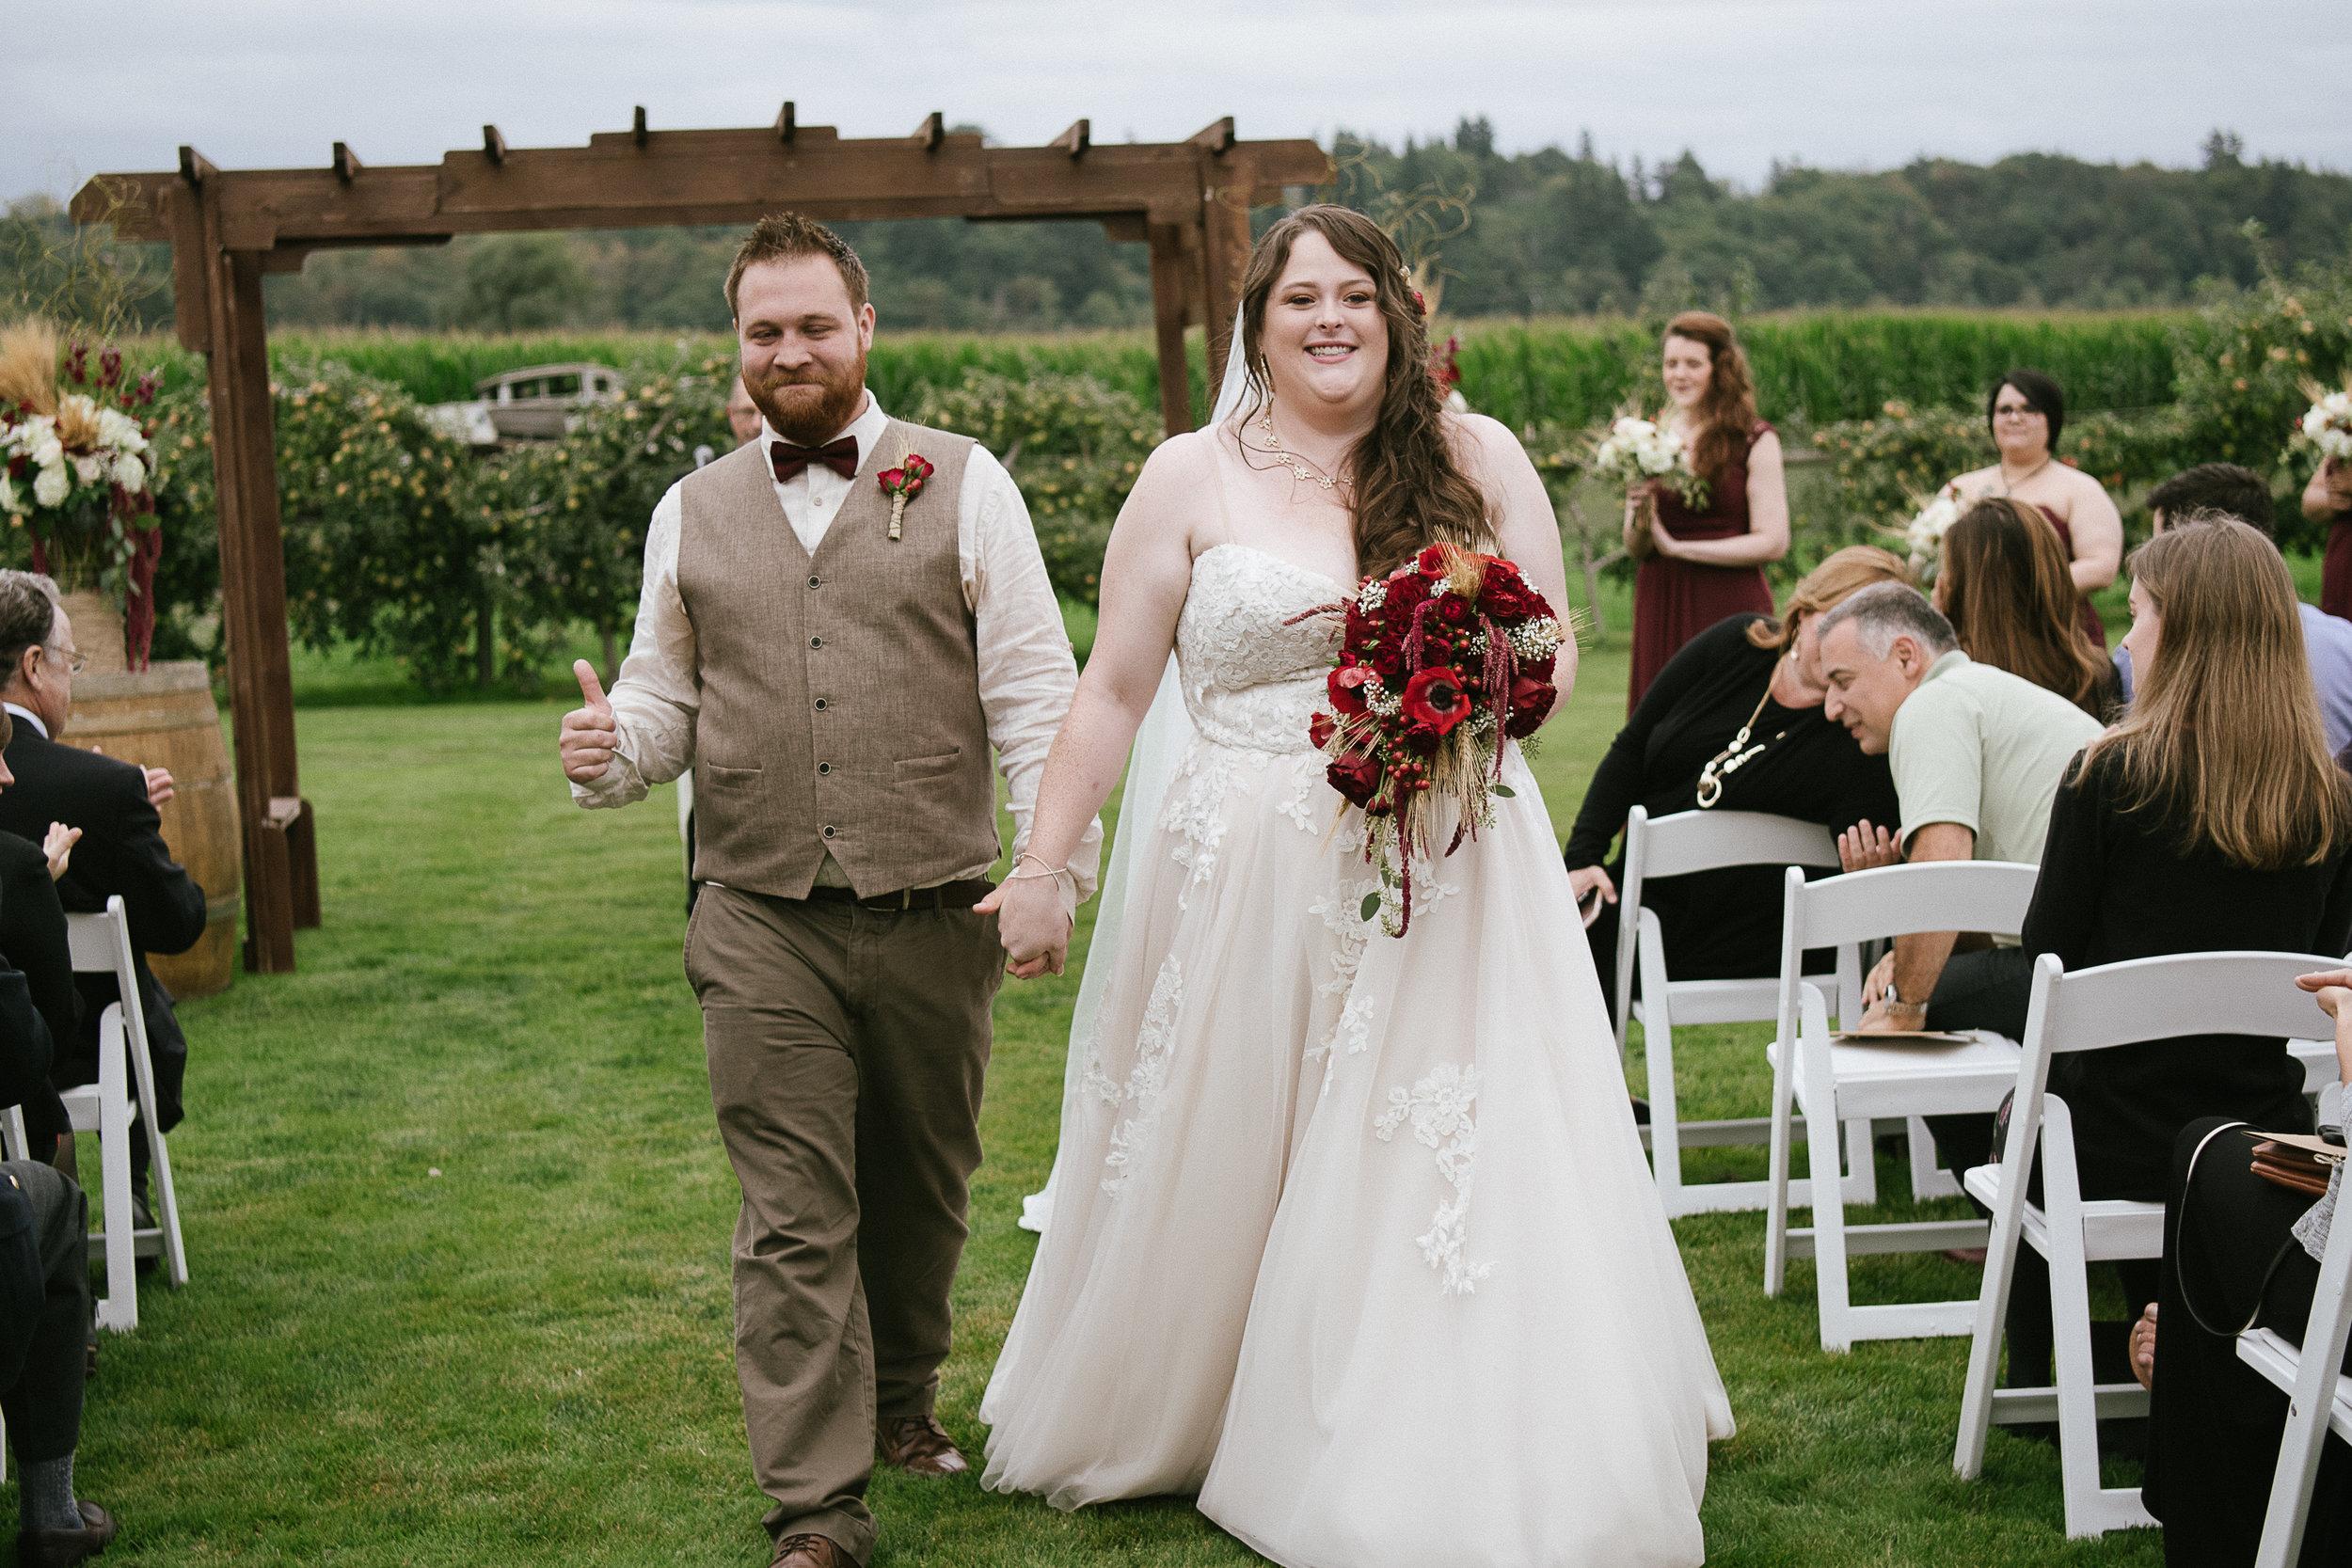 Swan Trail Farm Wedding_Sarah Schurman + Brian Skadan_Snohomish Wedding_Kelsey Lane Photography-6438-2.jpg